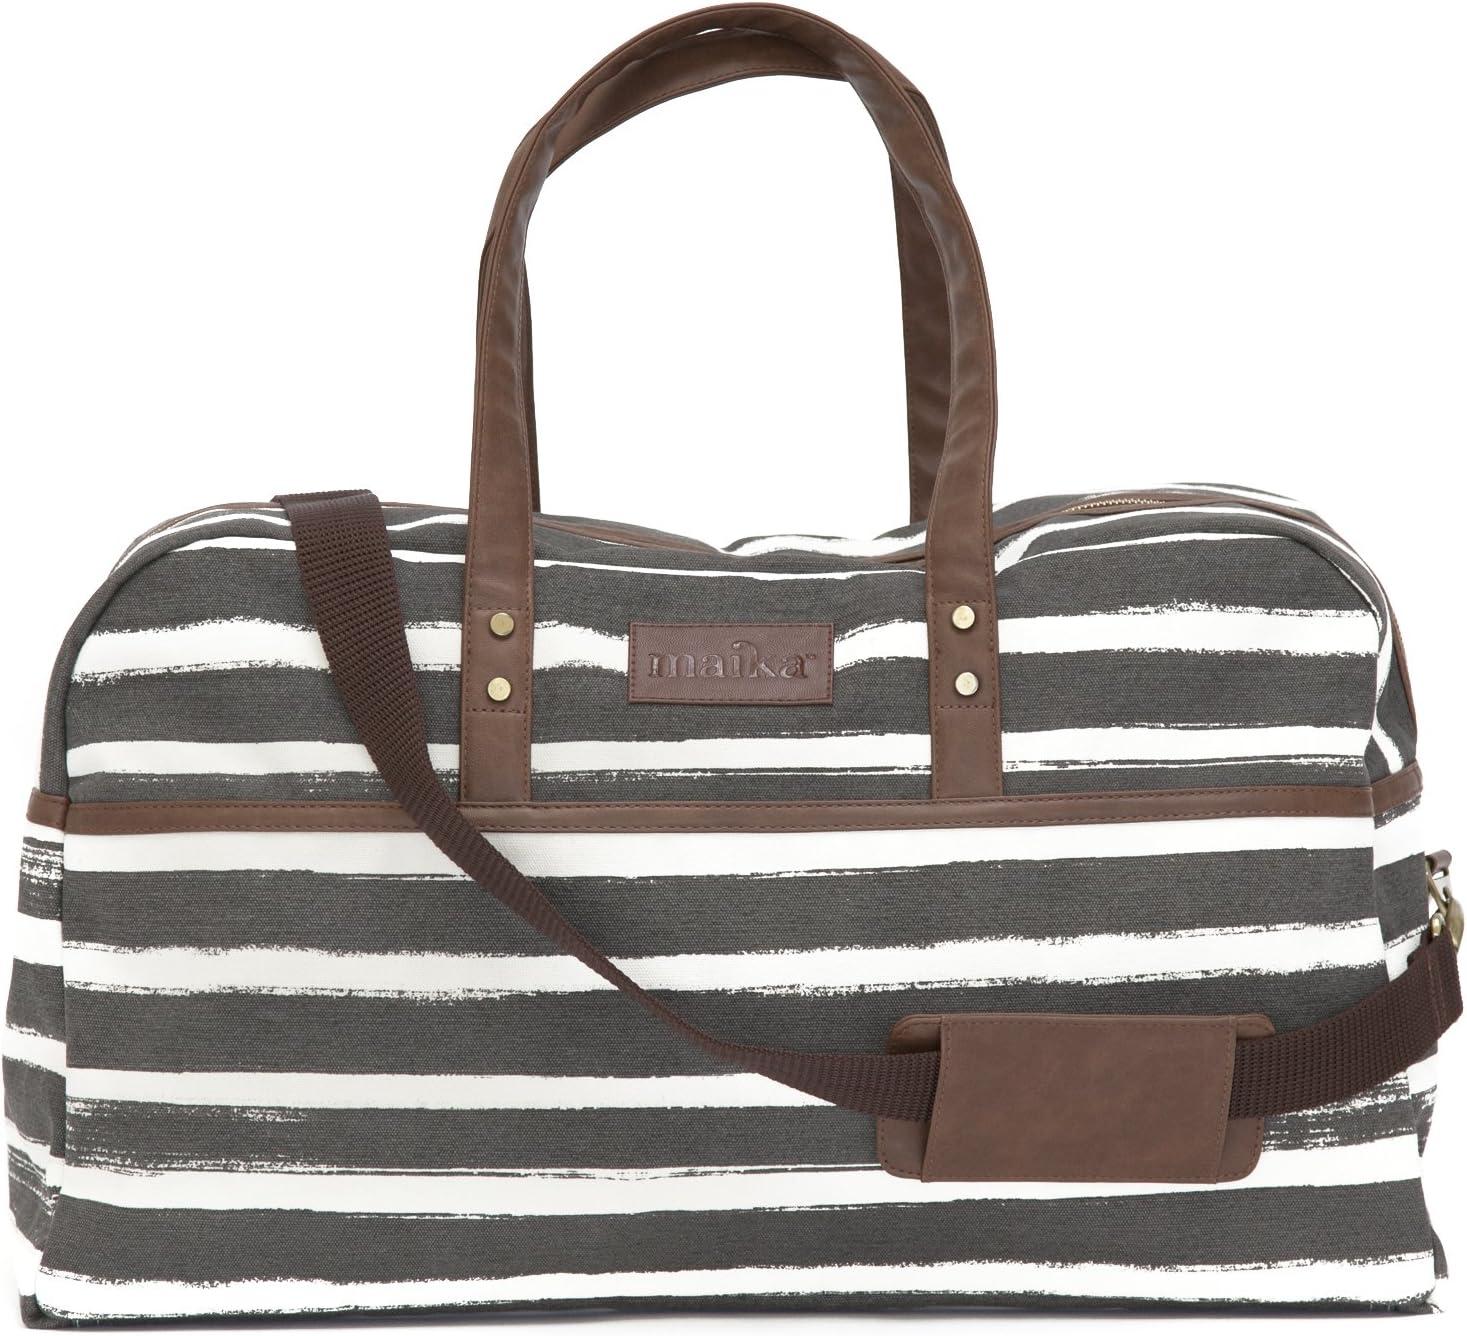 Maika Duffel Bag Stripes Charcoal